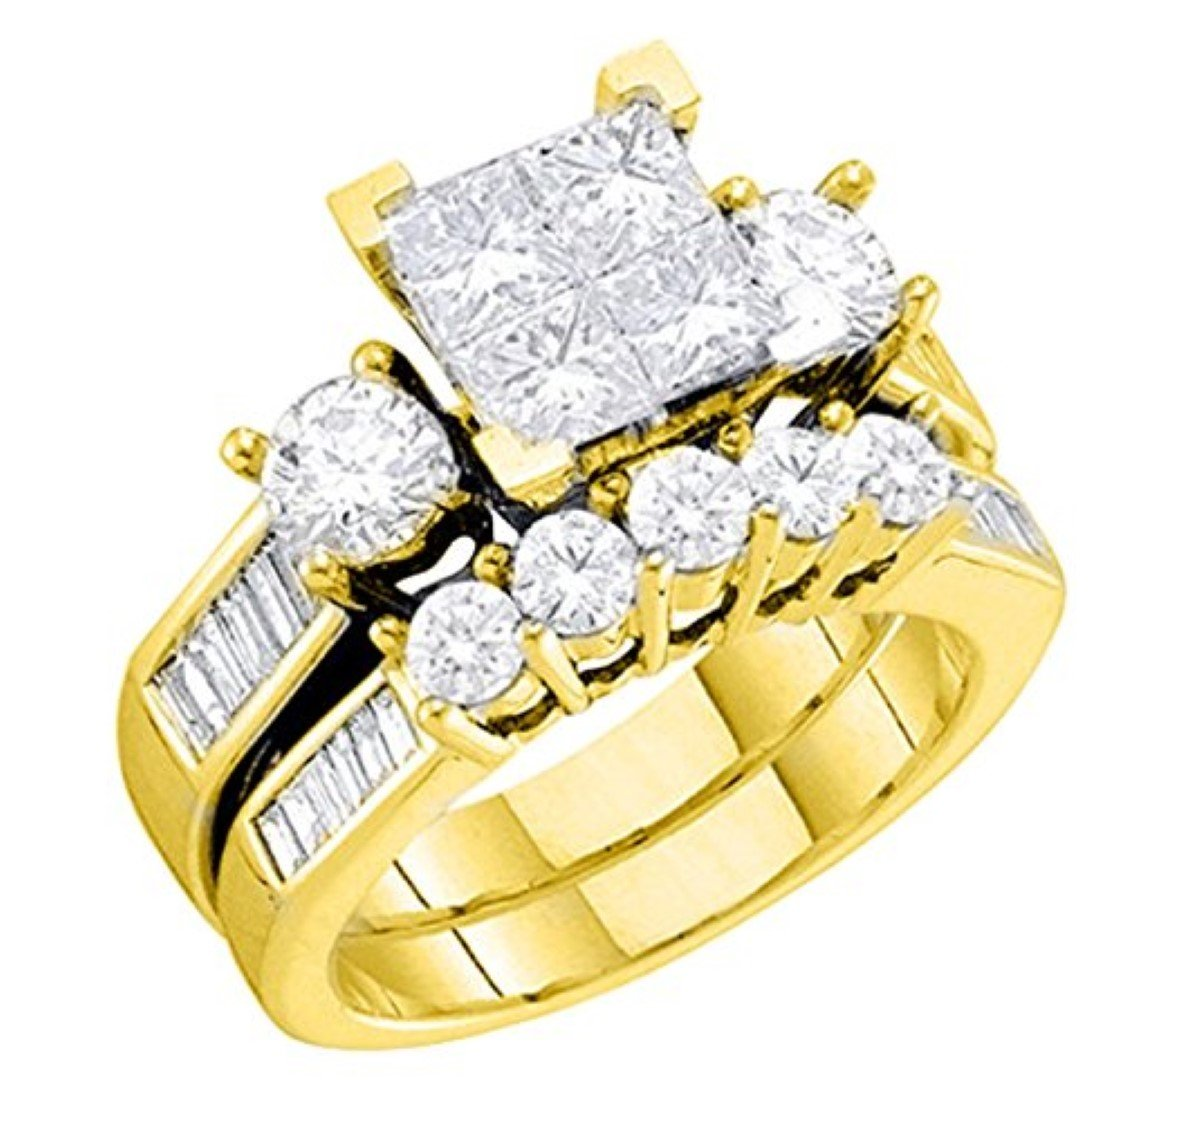 Diamond Brida10K White Gold Engagement Ring / Wedding Ring Set Princess Cut White Gold 10k 2pc Set (1.00cttw, i2/i3, I/j) (yellow-gold, 10)